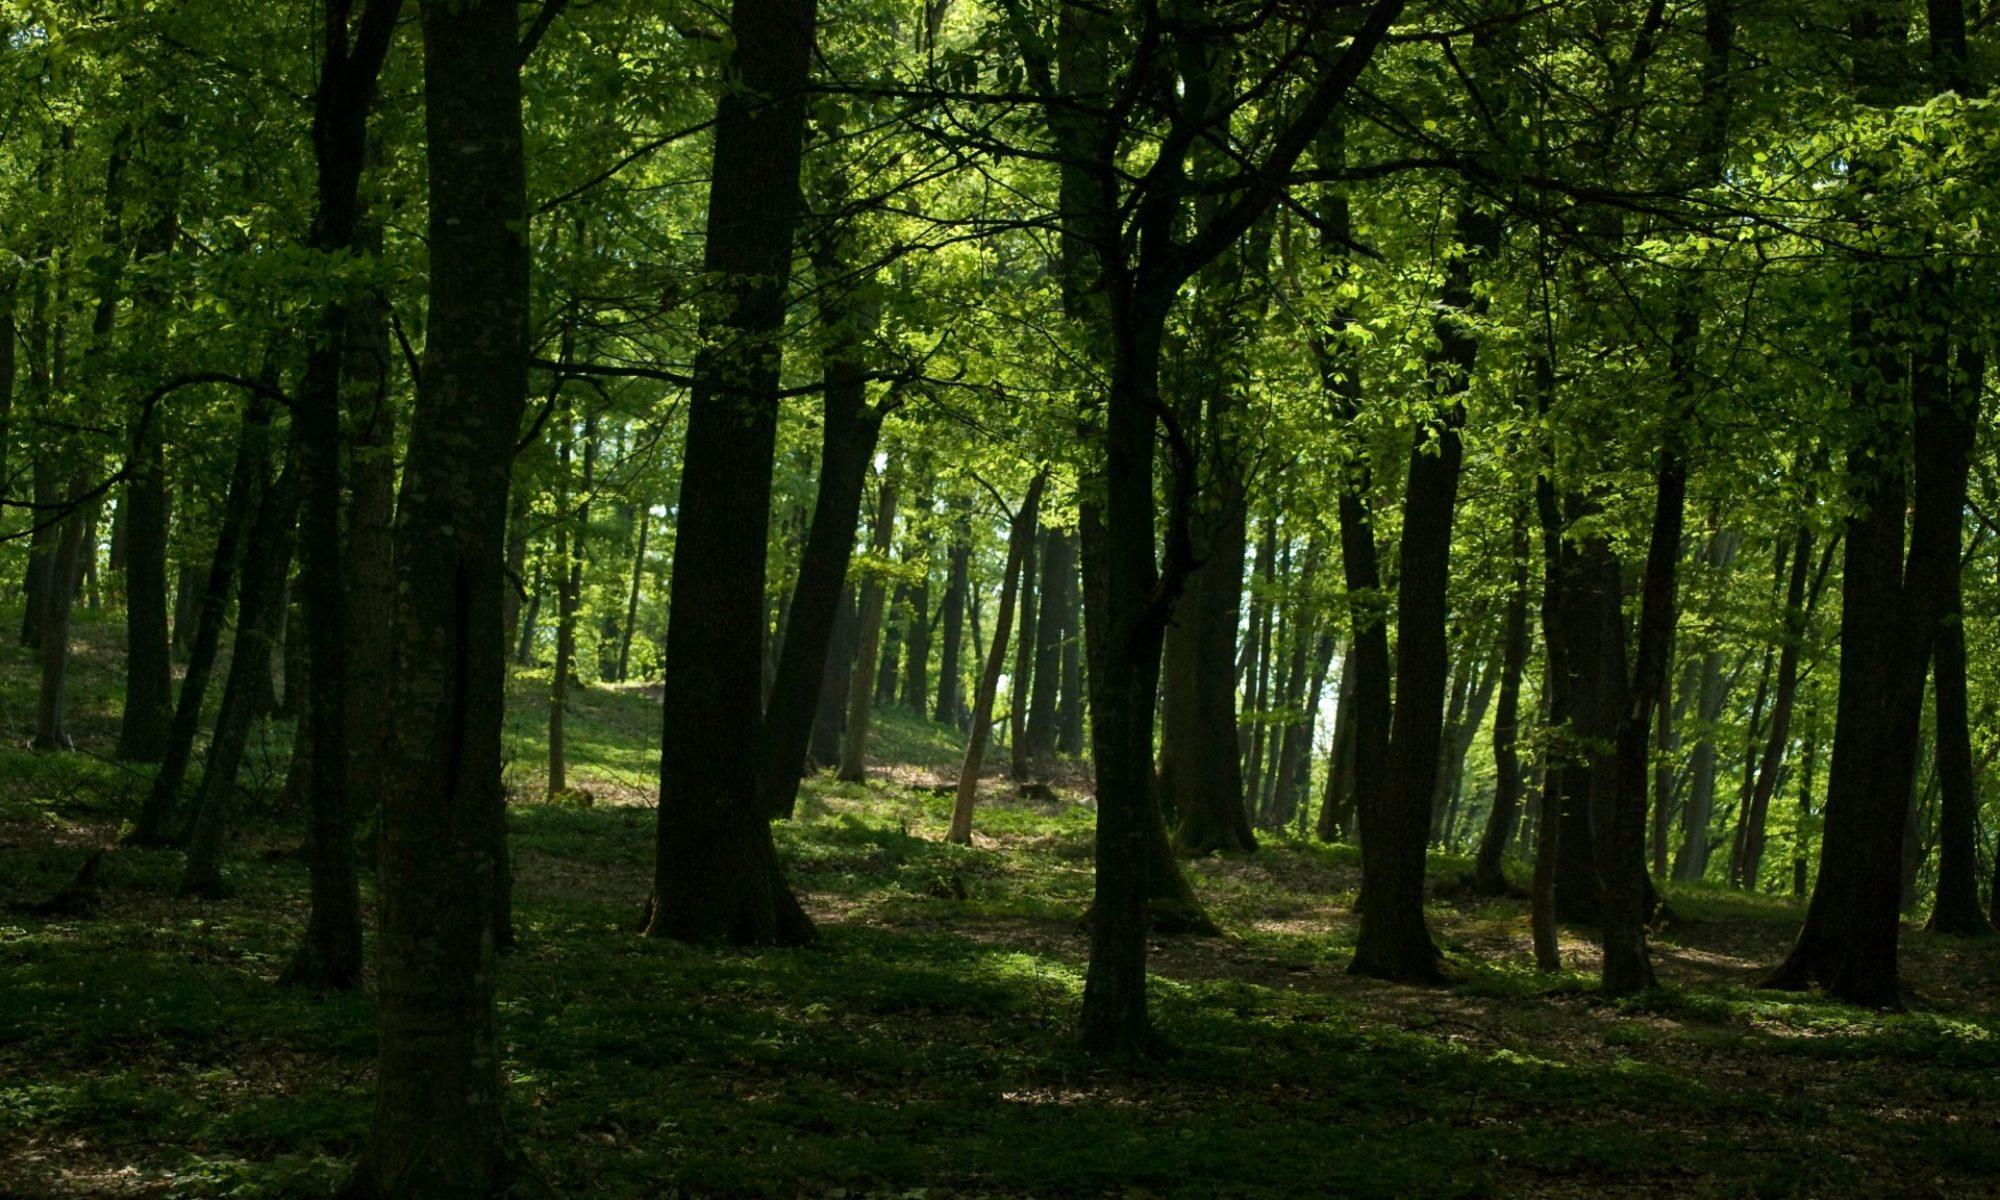 The Druid's Grove